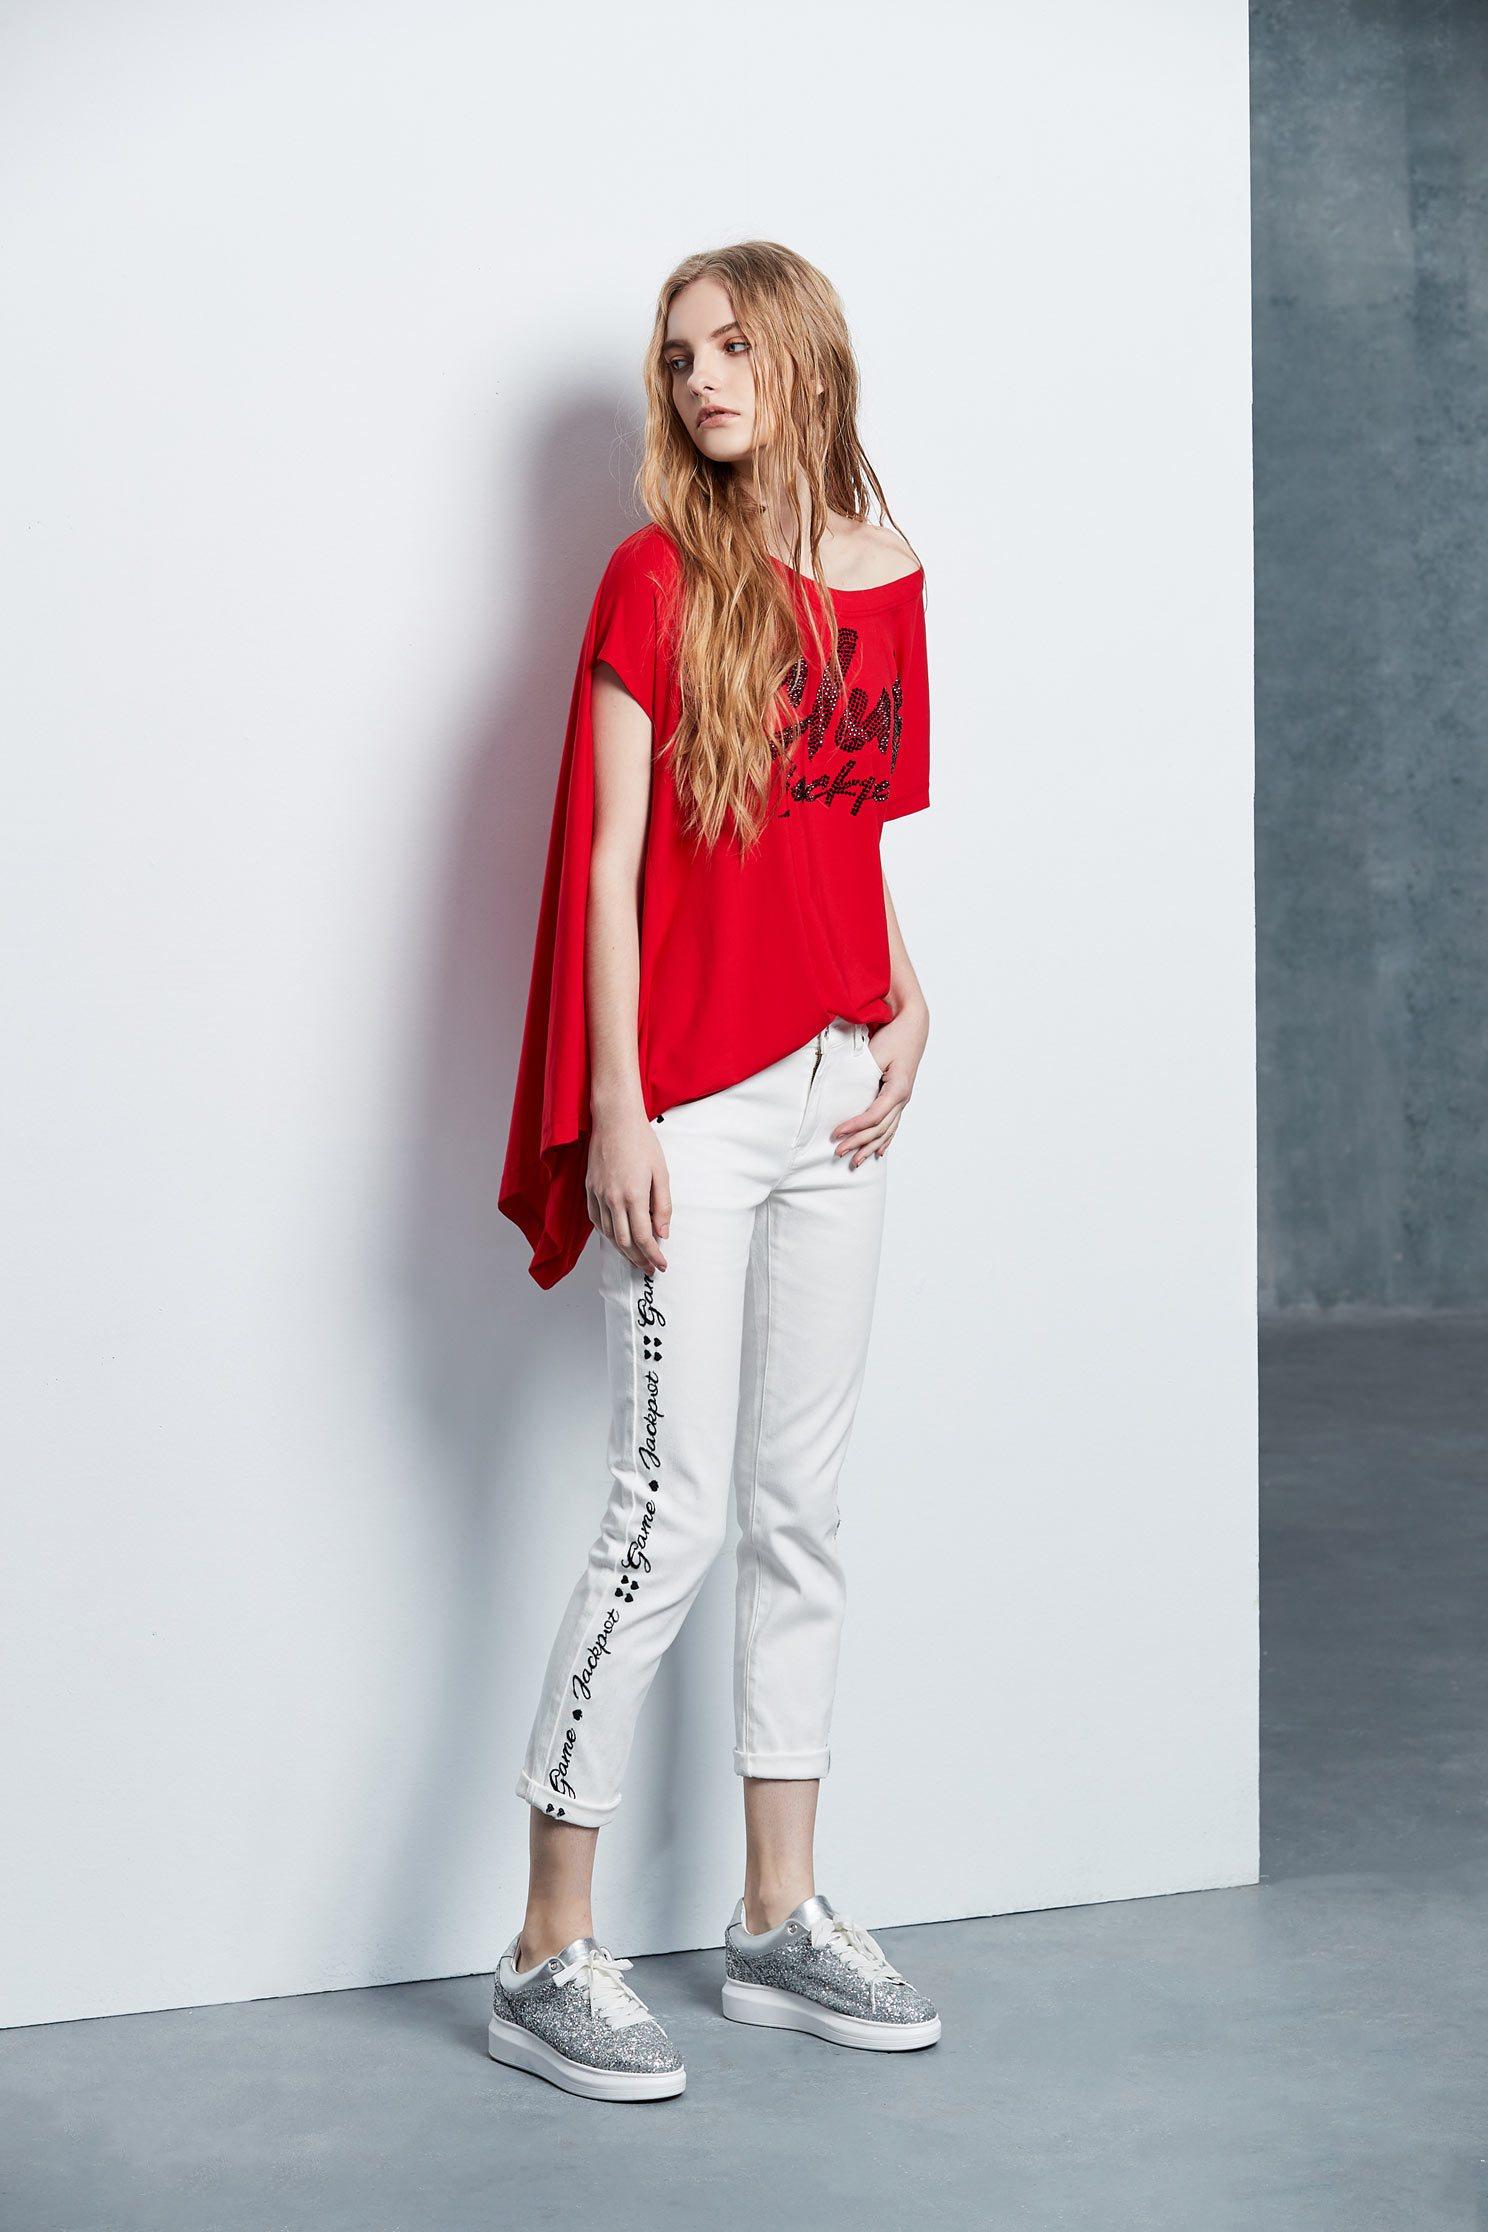 Irregular fashion design tops